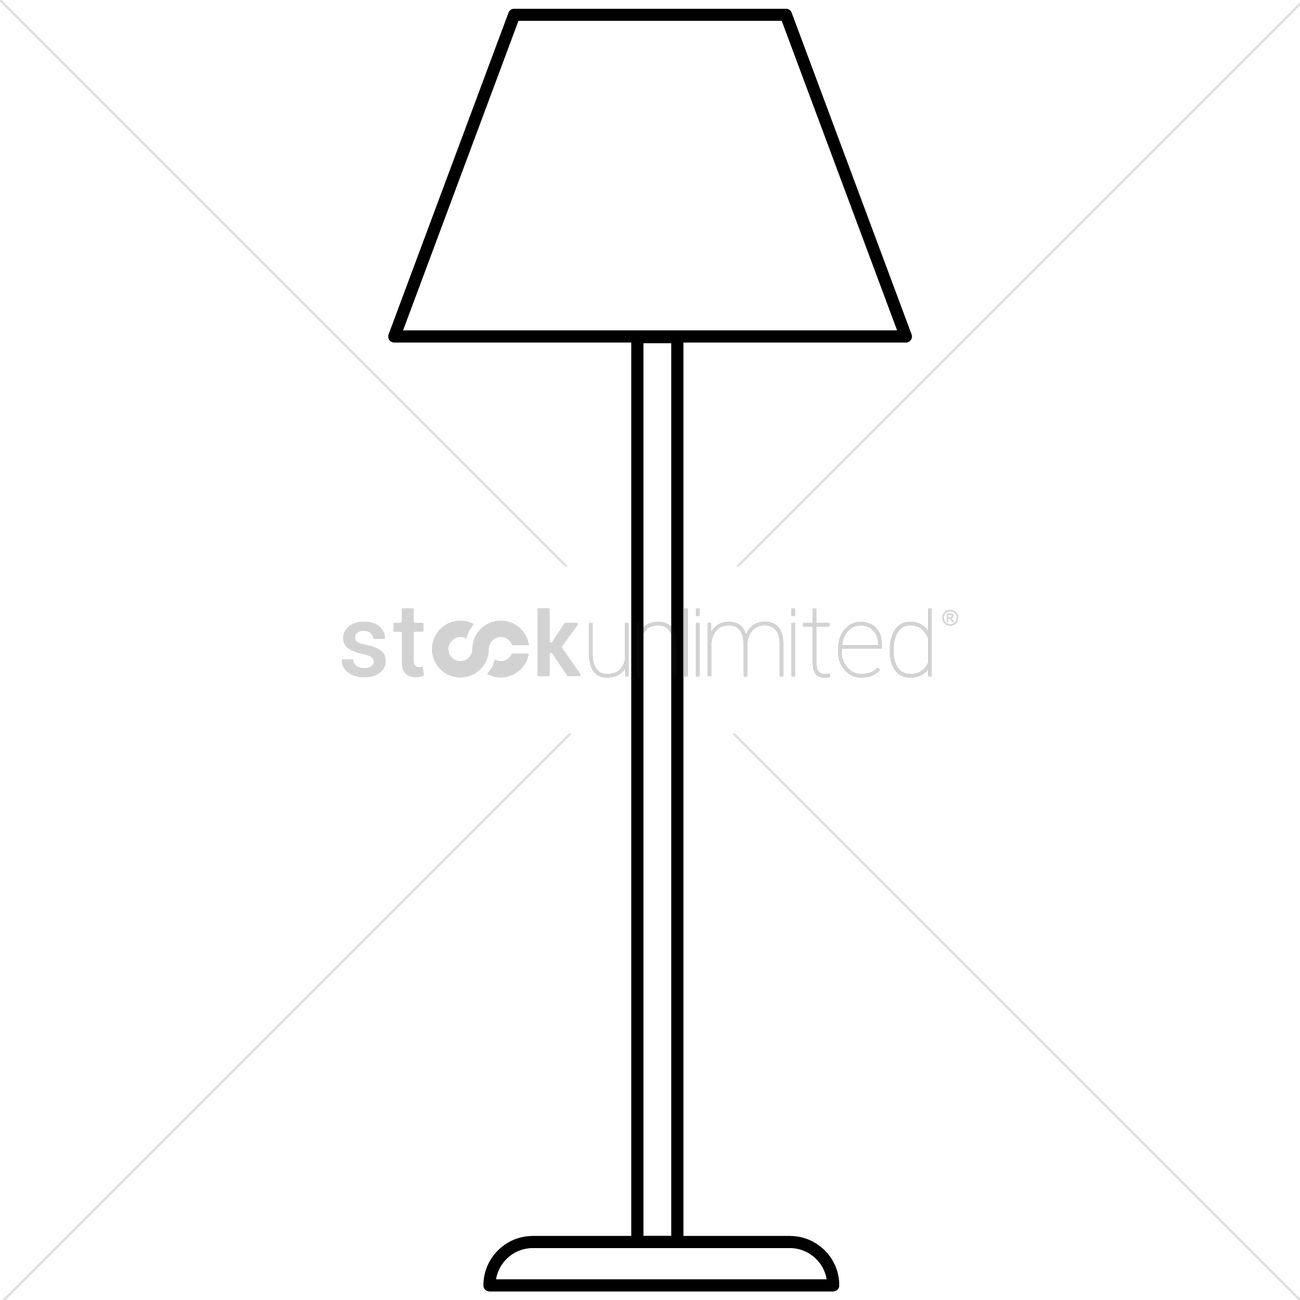 1300x1300 Illuminated Light Light Bulb Clipart, Explore Pictures